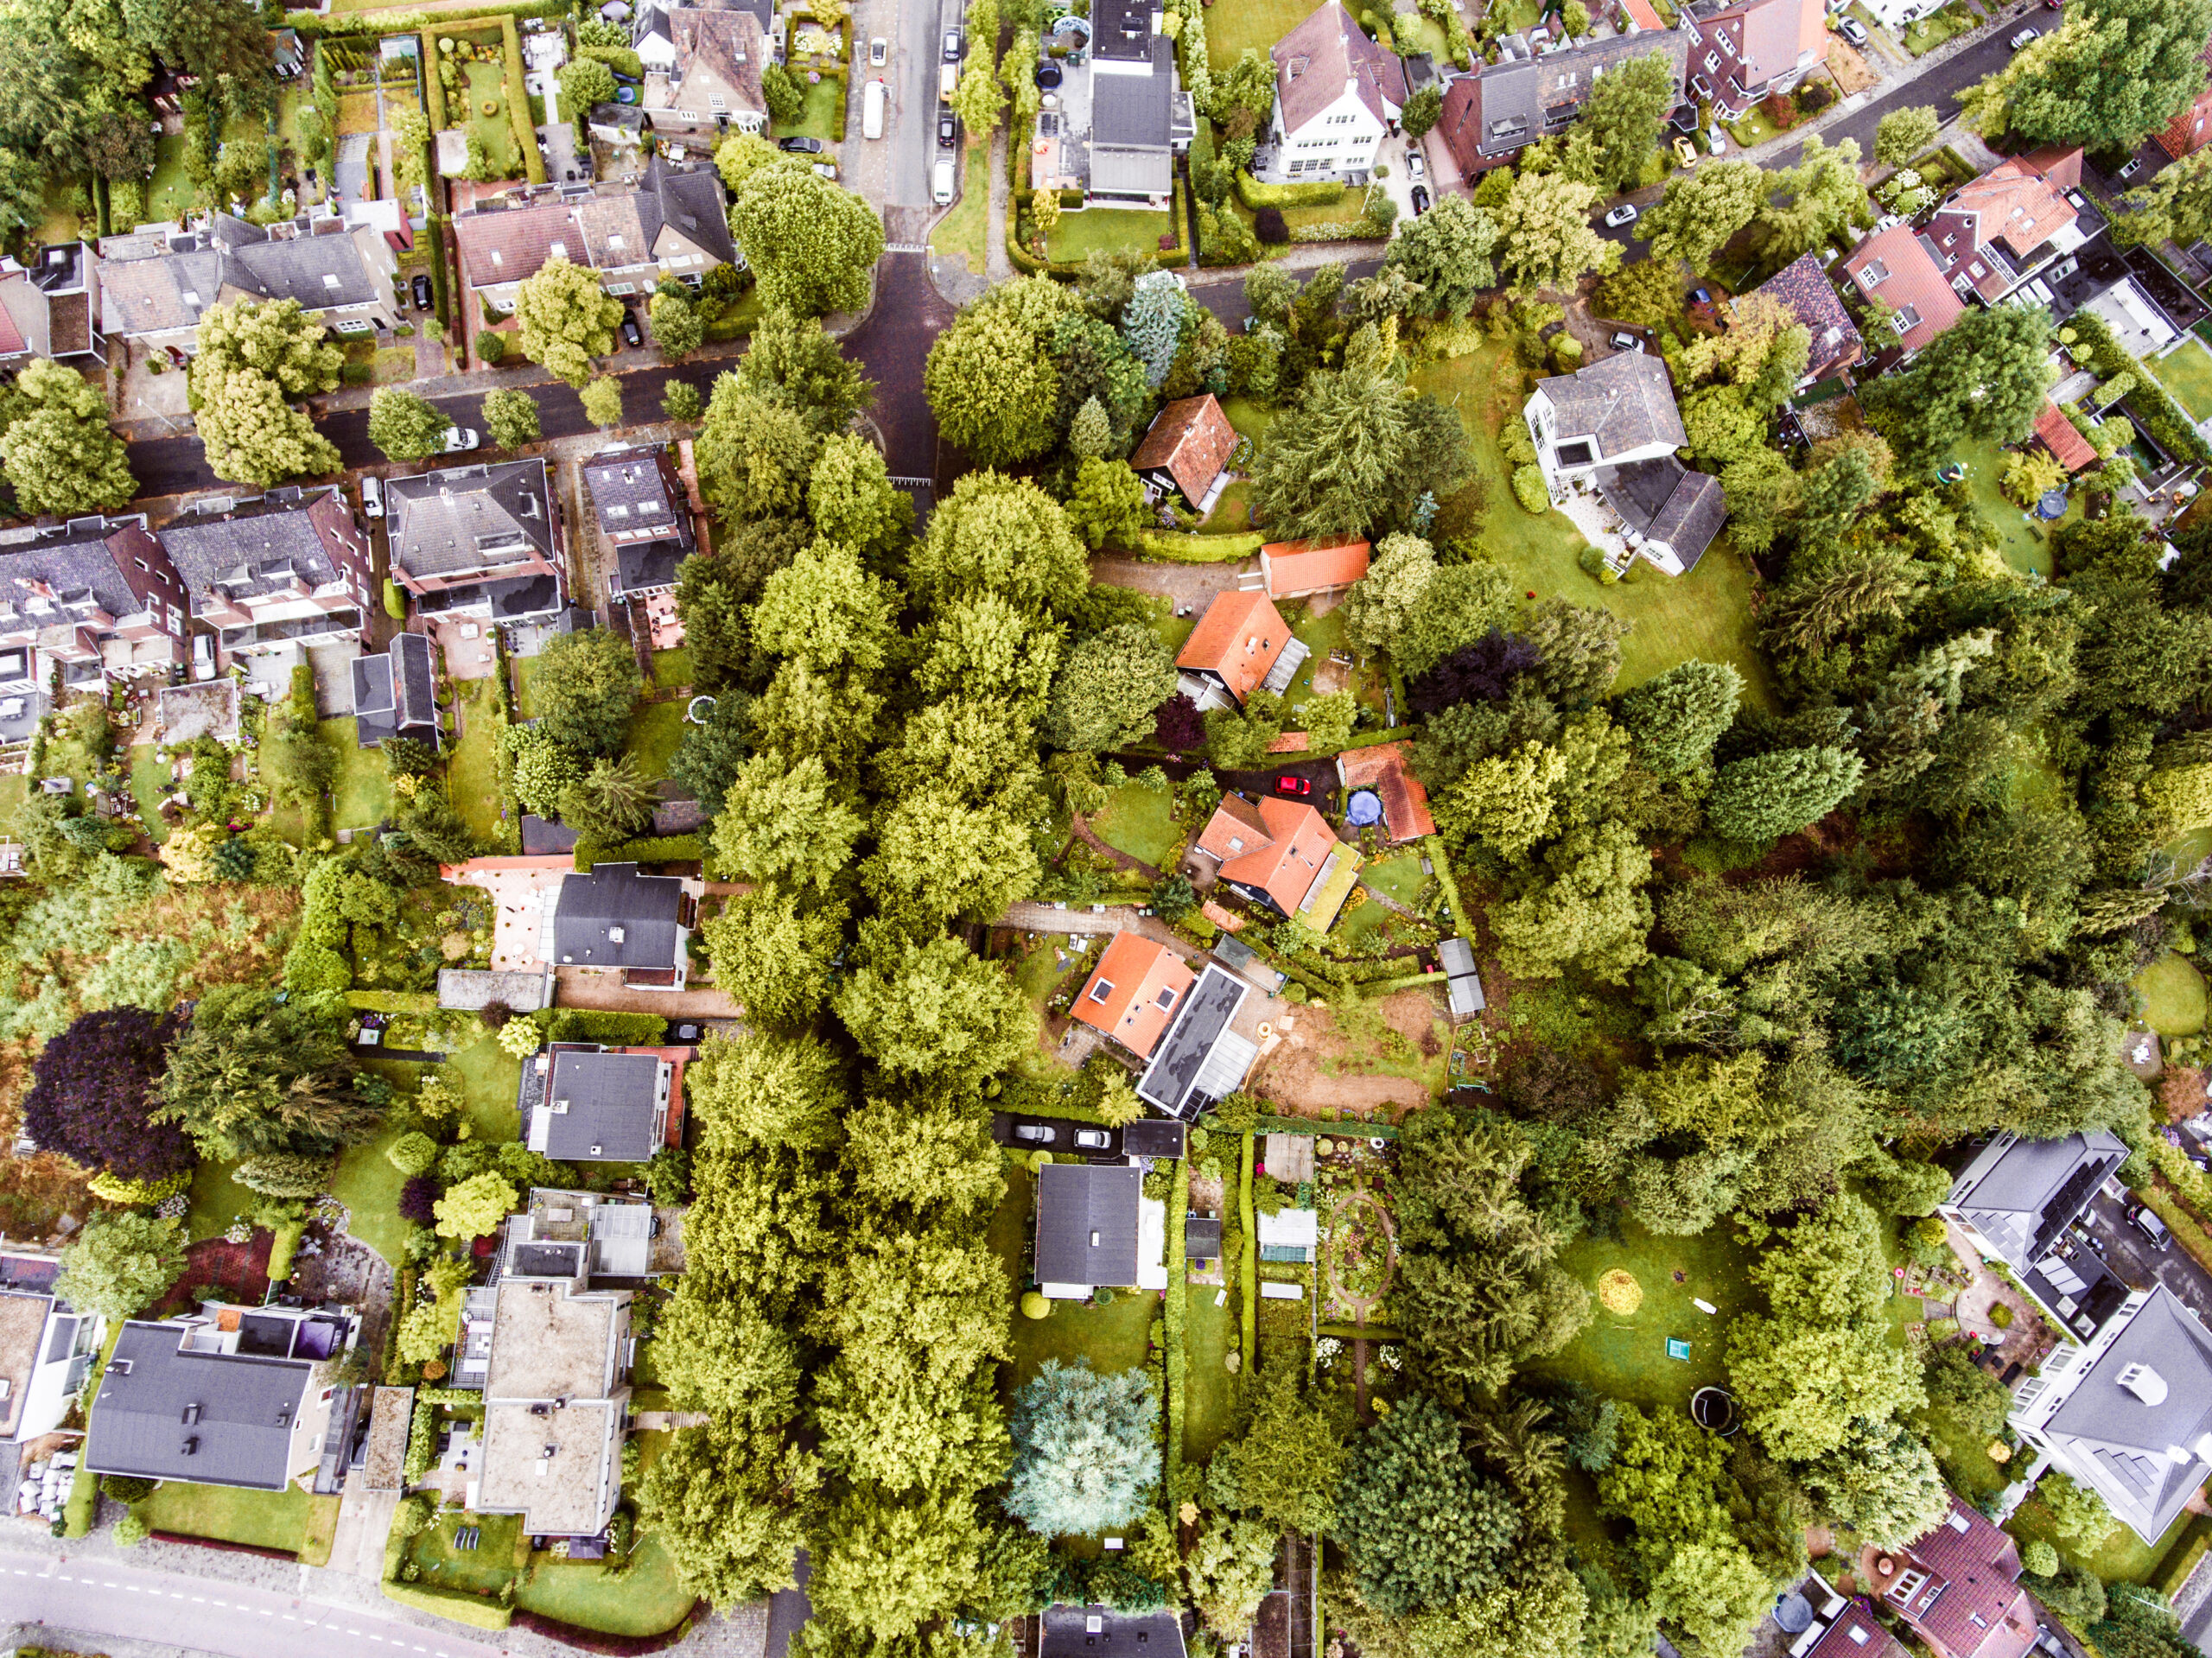 Bird's eye view over a residential development community